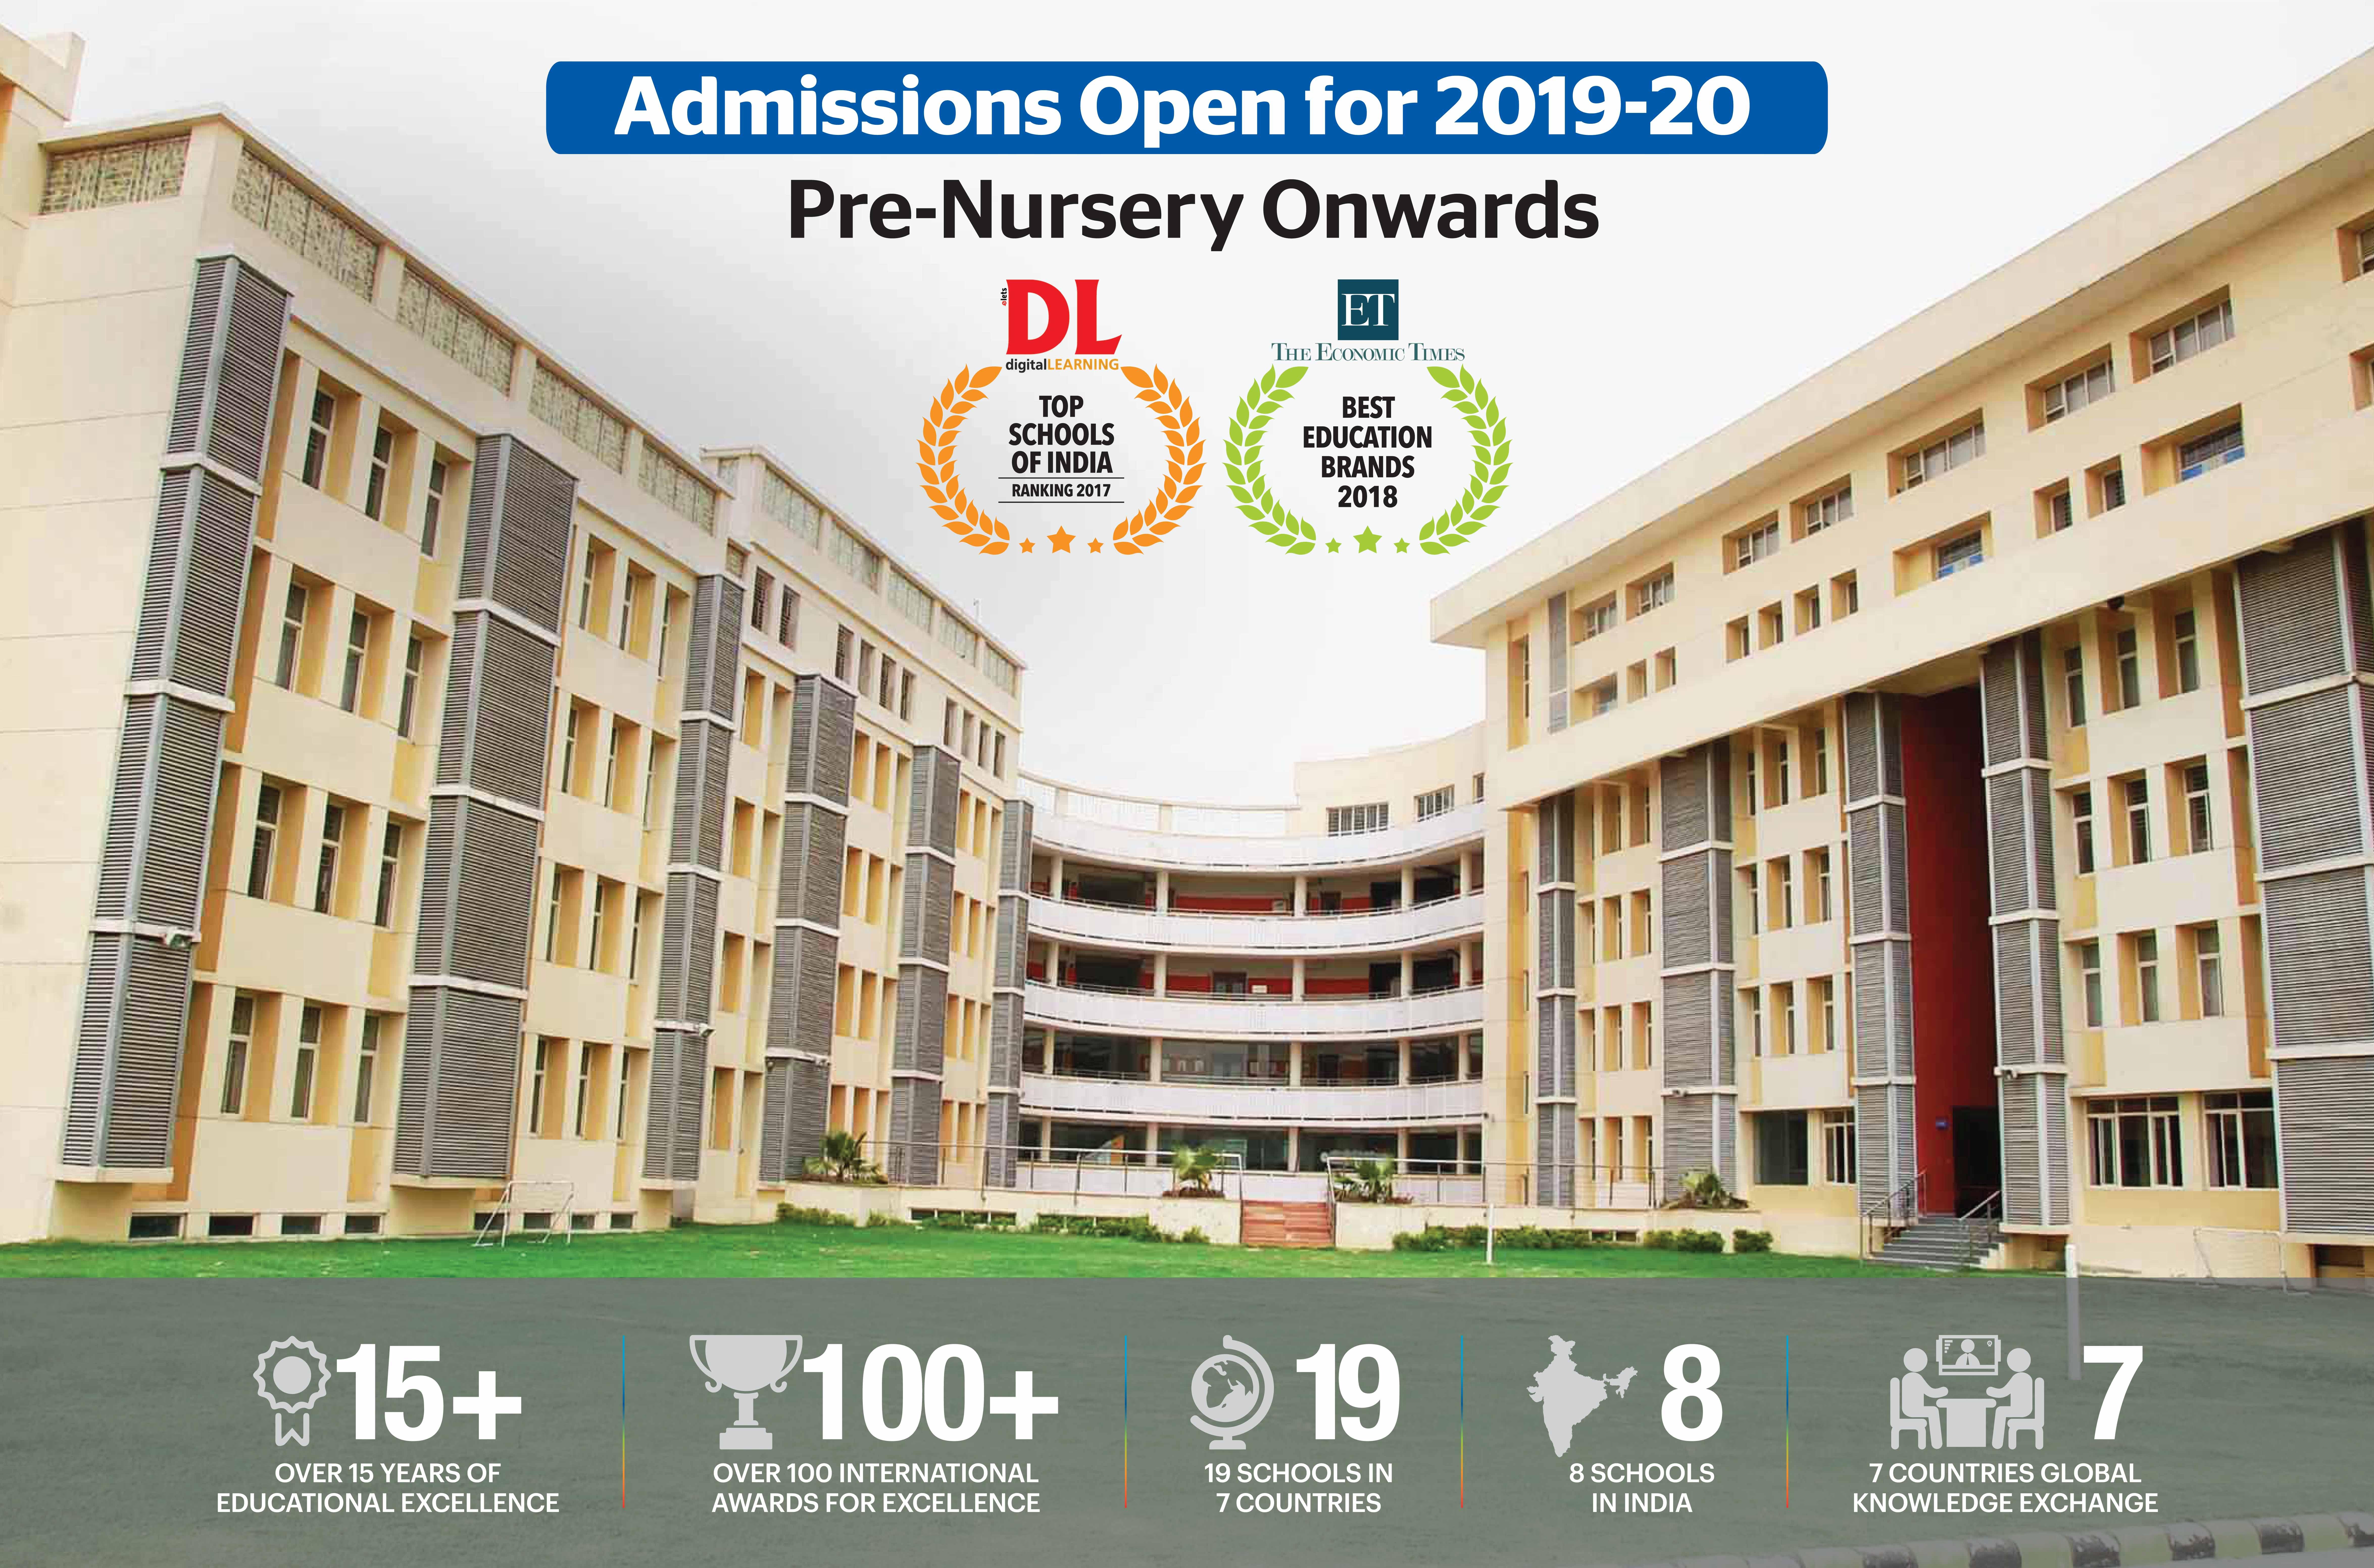 GIIS Noida School image with Credentials.jpg